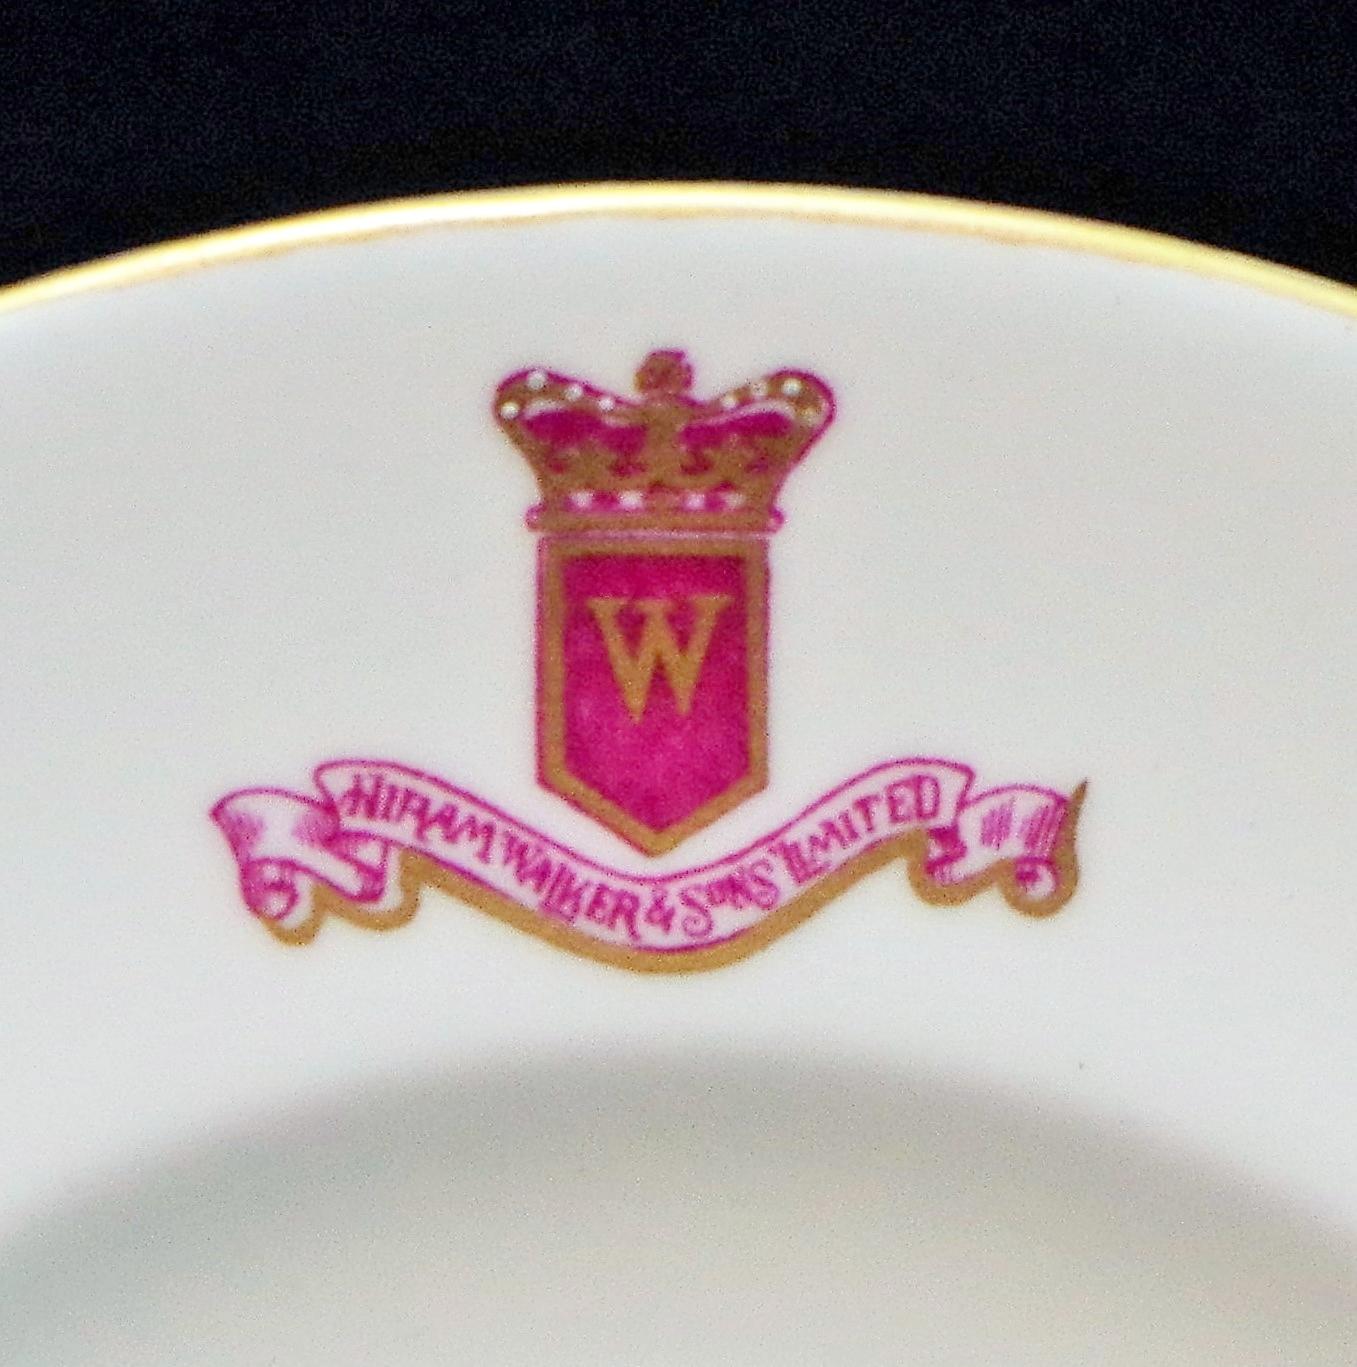 royal-crown-derby-hiram-walker-and-sons-ltd-crest-close-up